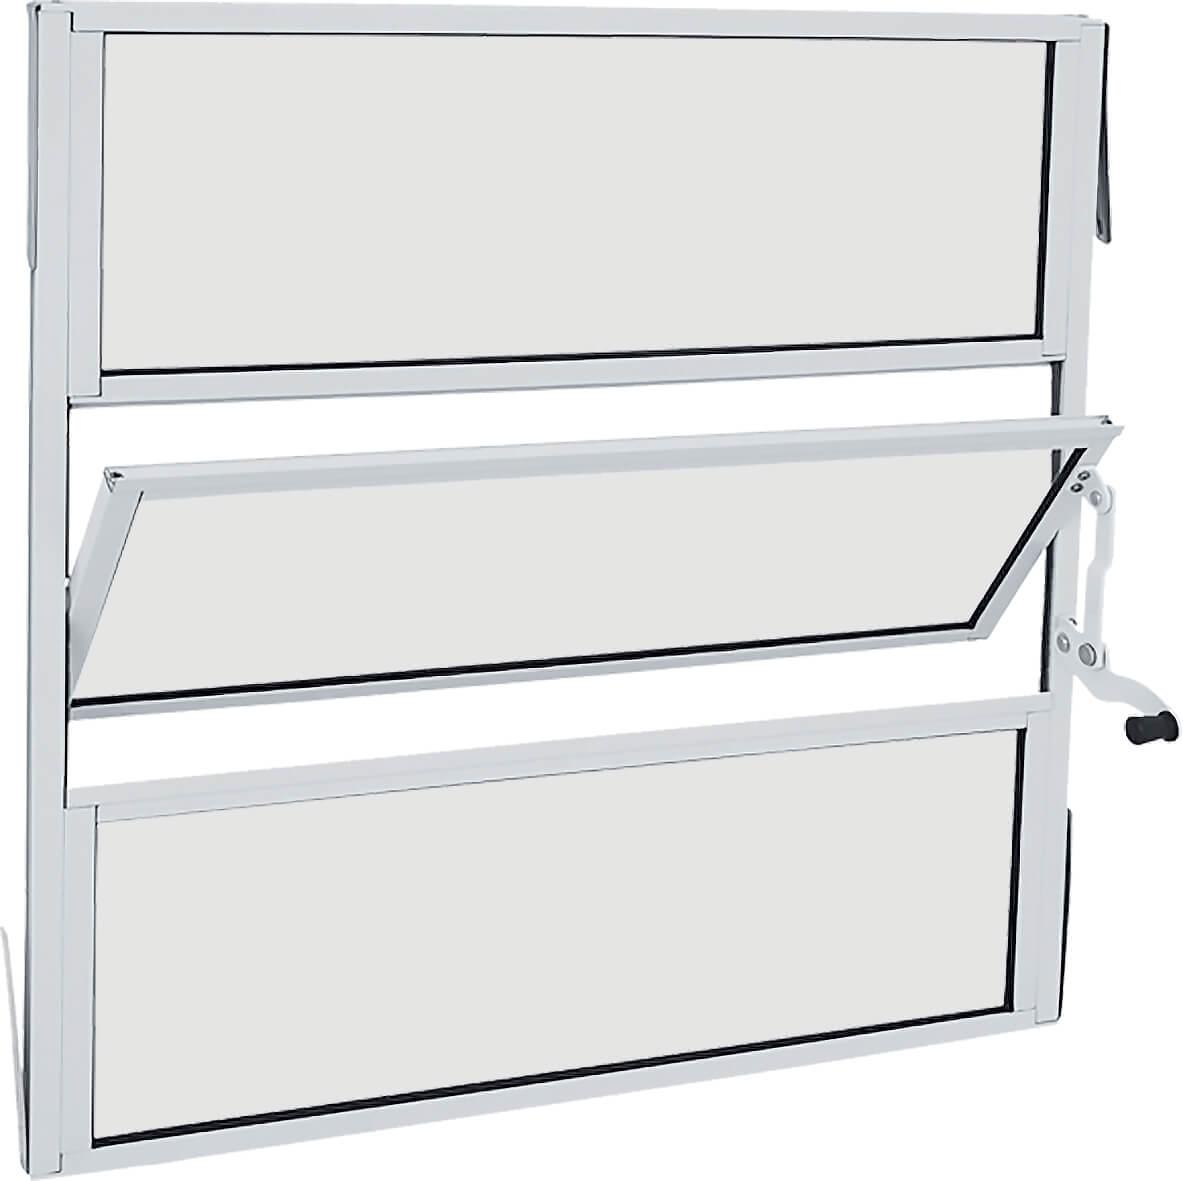 Alumifit Janela Basculante 0.60x0.60x1.35 Branca Ref. 78.30.102-3 Sasazaki